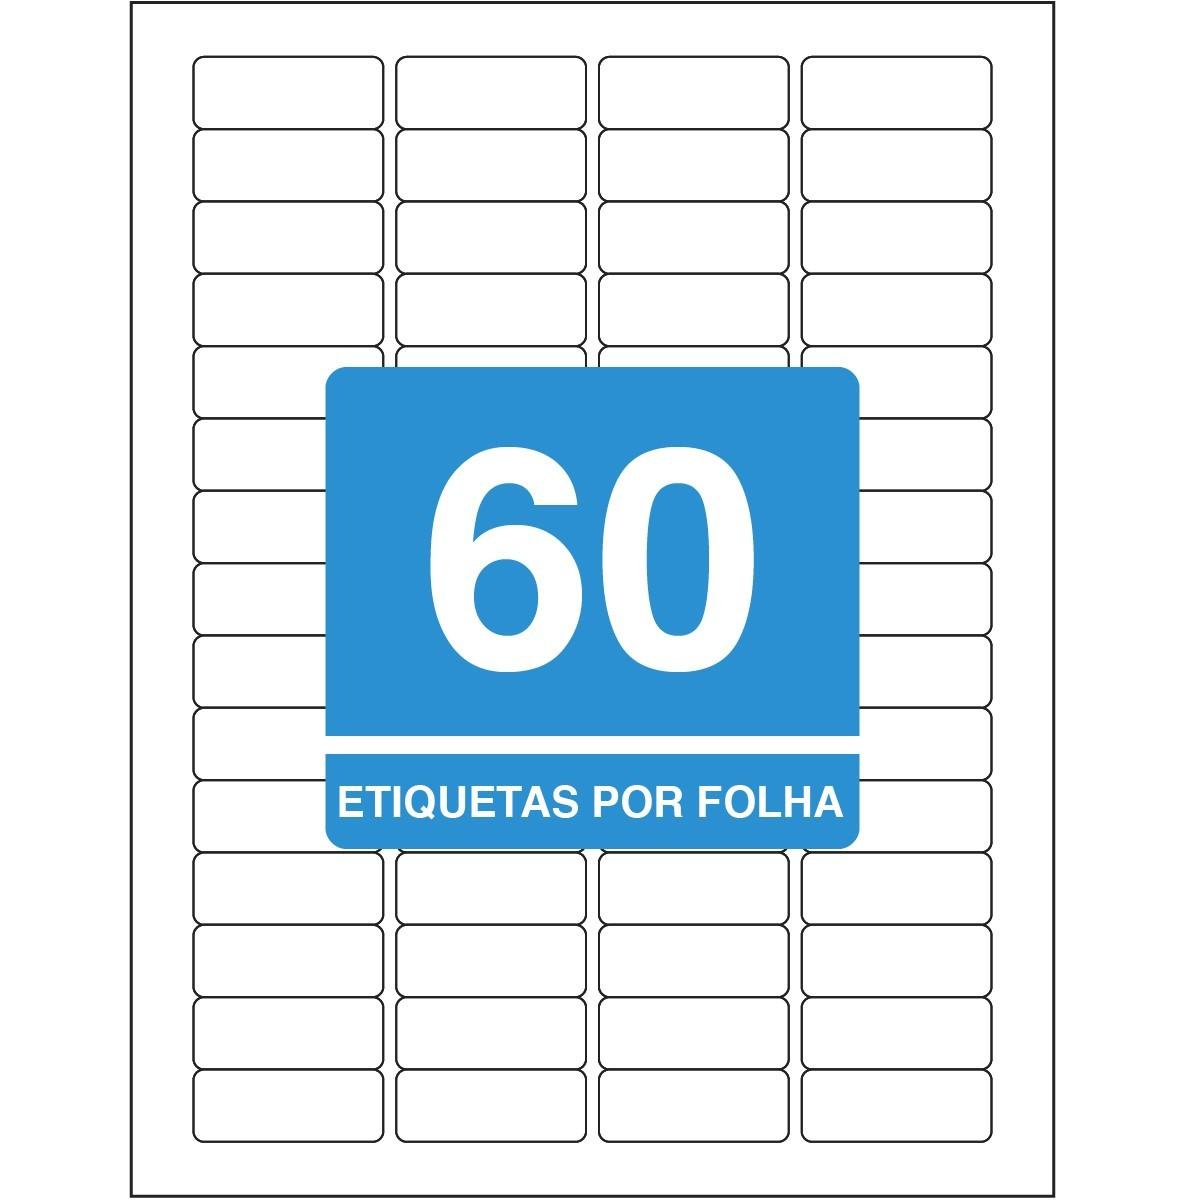 Etiqueta Adesiva Inkjet + Laser Carta 16,93x44,45mm 6089 10 Fls 600 Und - Tilibra